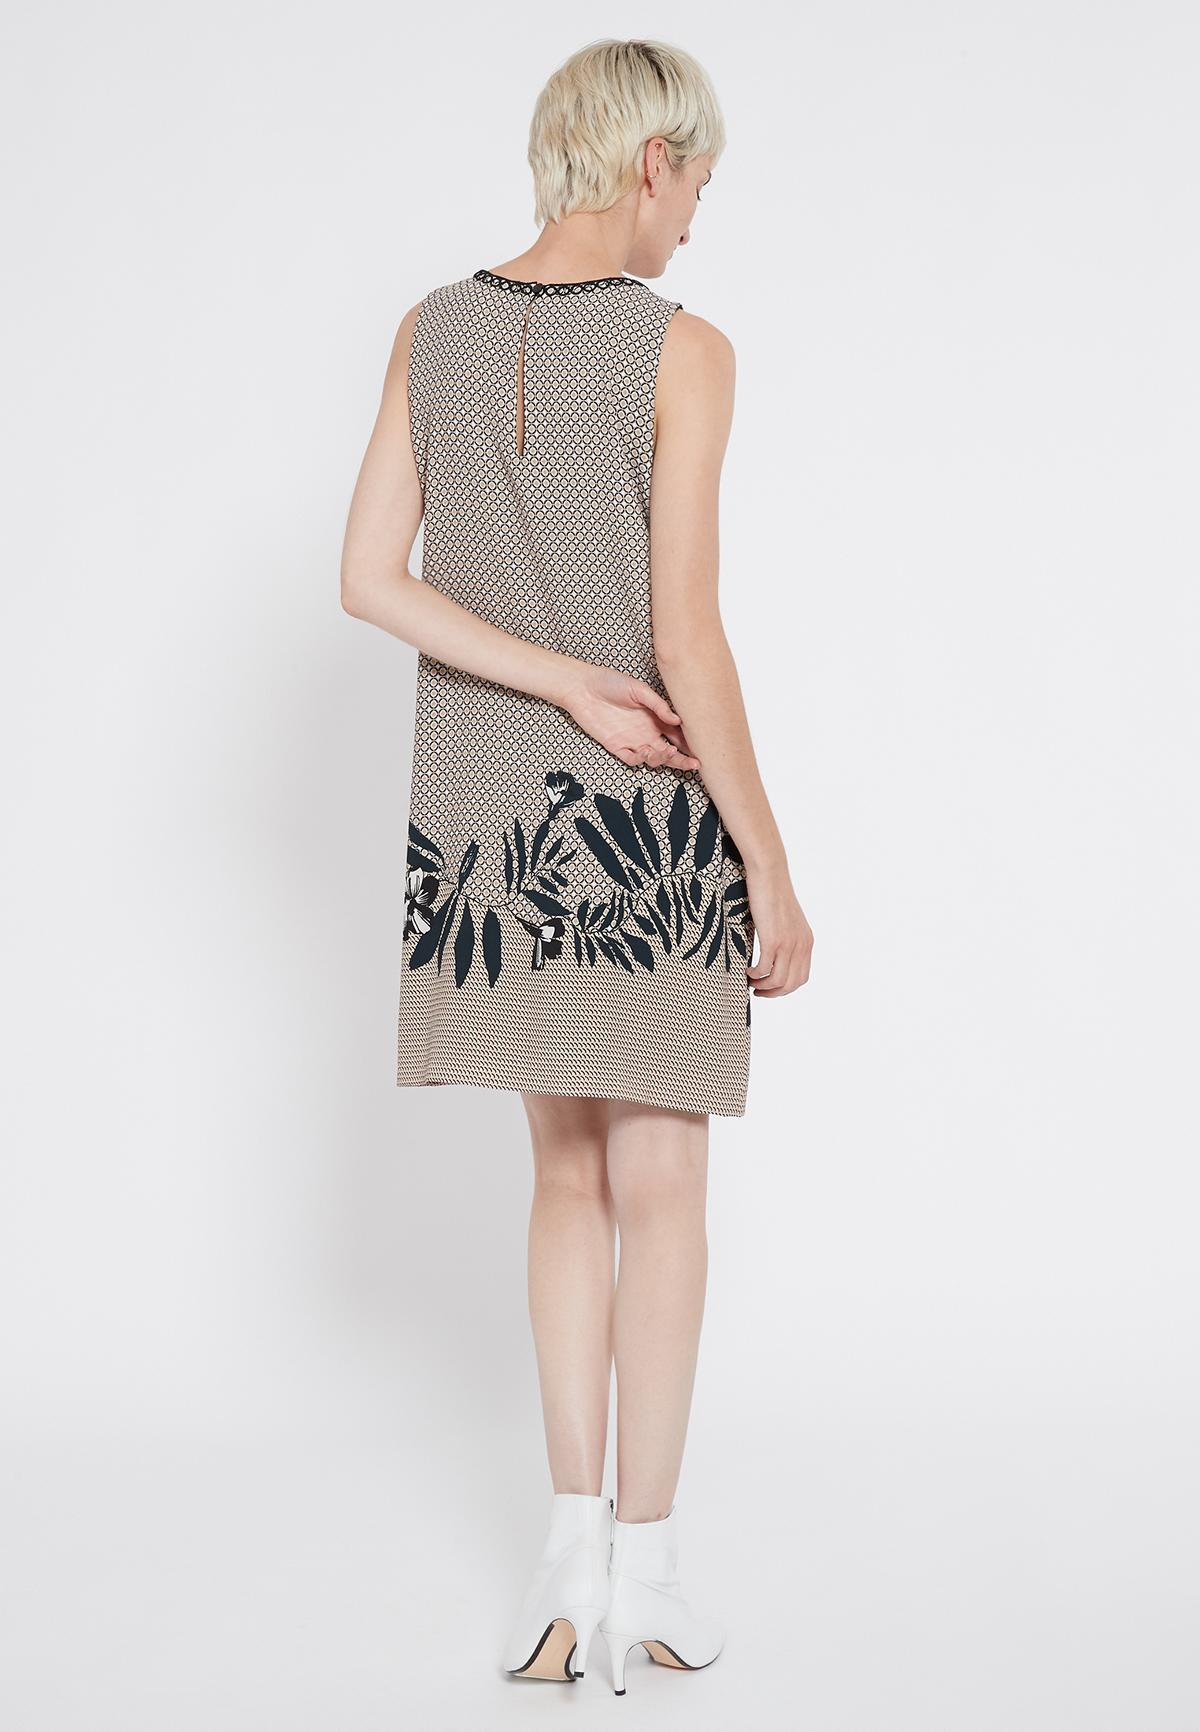 Rear view of Ana Alcazar Sleeveless Dress Sedoni  worn by model